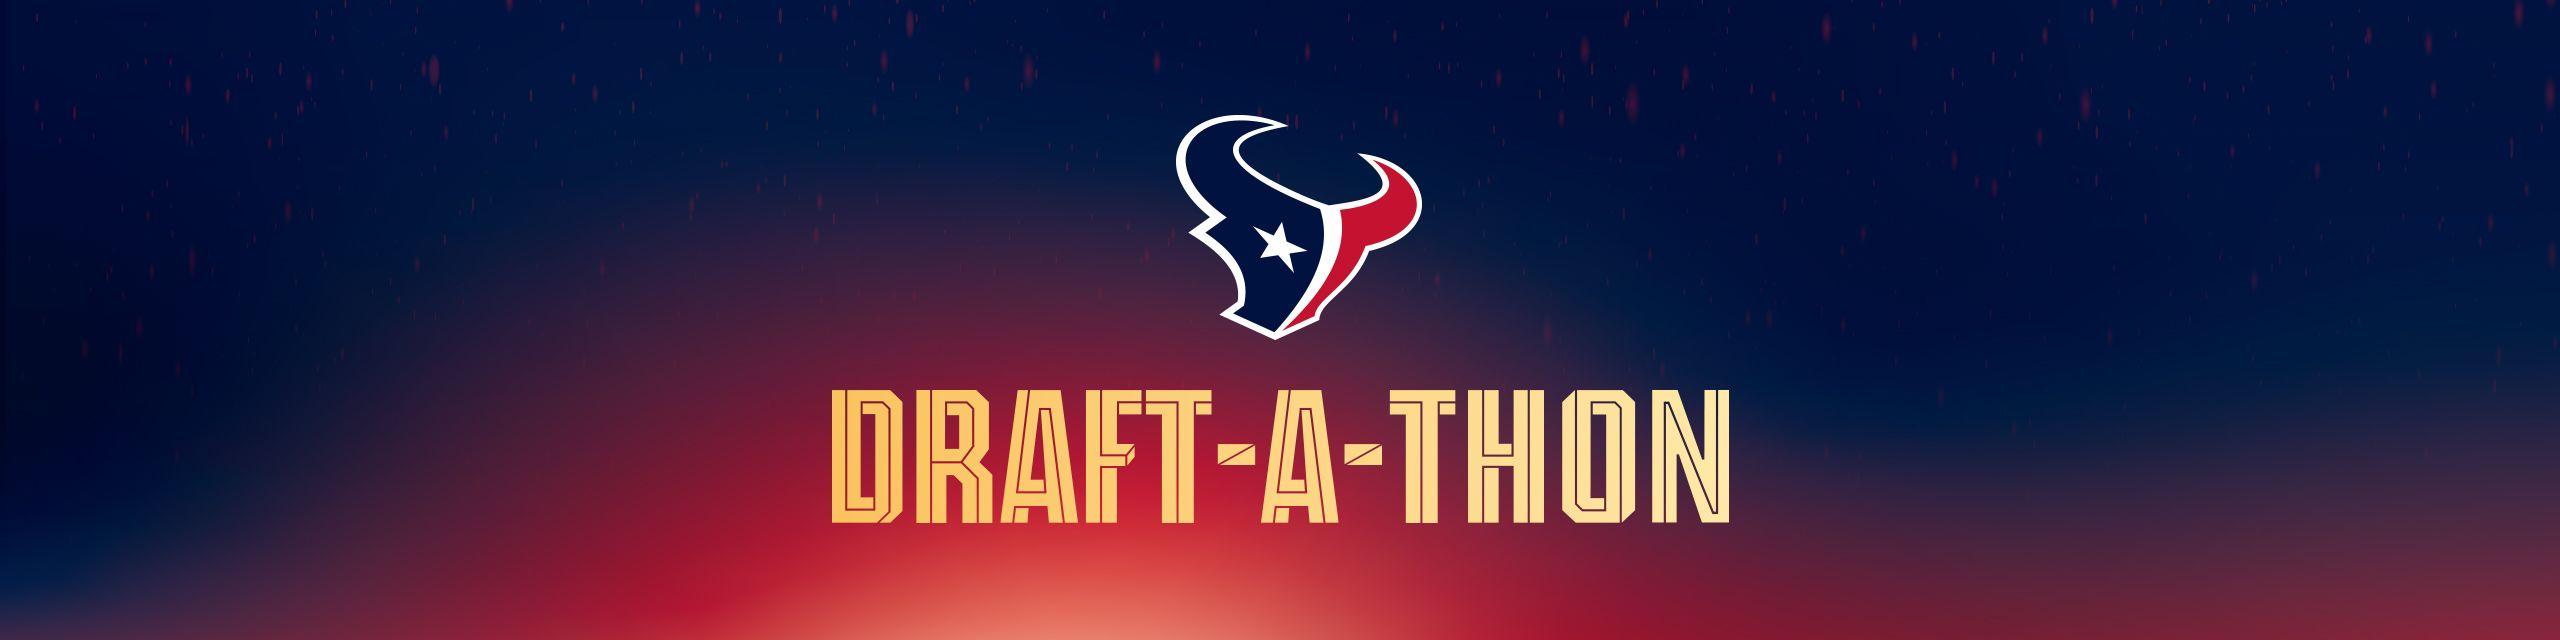 Text: Draft-a-thon